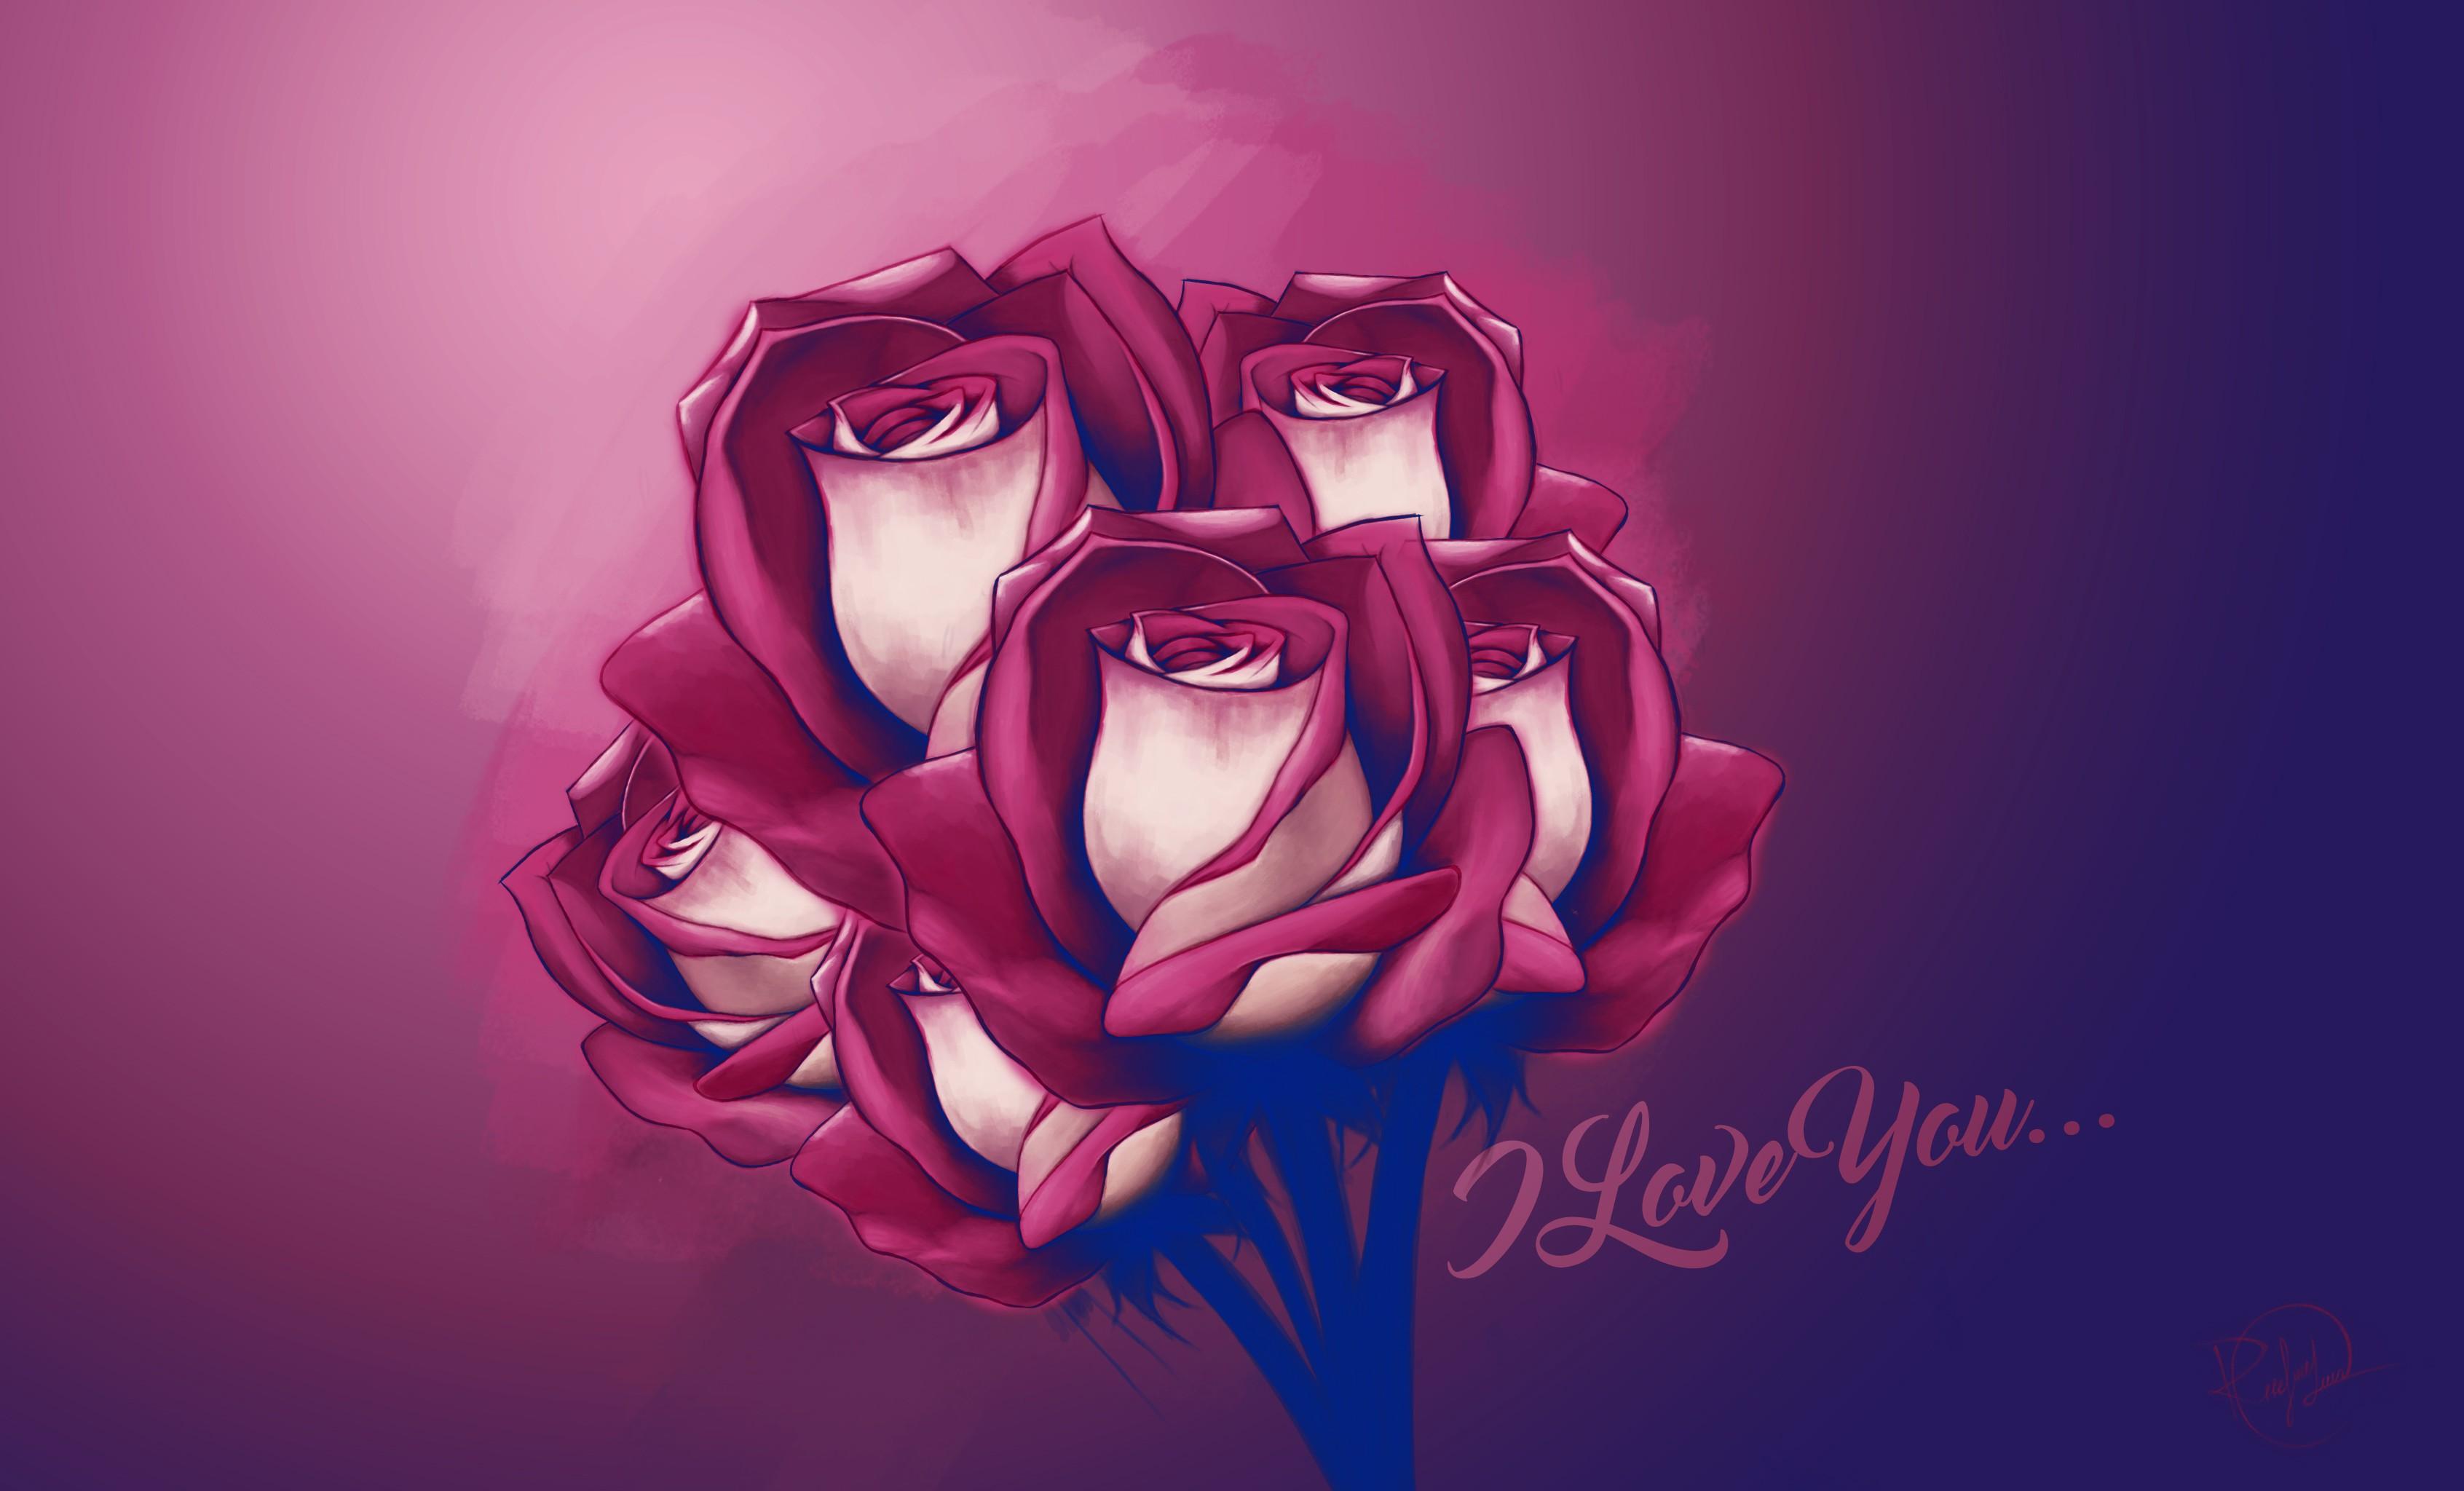 Popular Wallpaper Love Painting - drawing-painting-illustration-digital-art-flowers-anime-love-rose-flower-computer-wallpaper-font-organ-33481  Gallery_433354.jpg